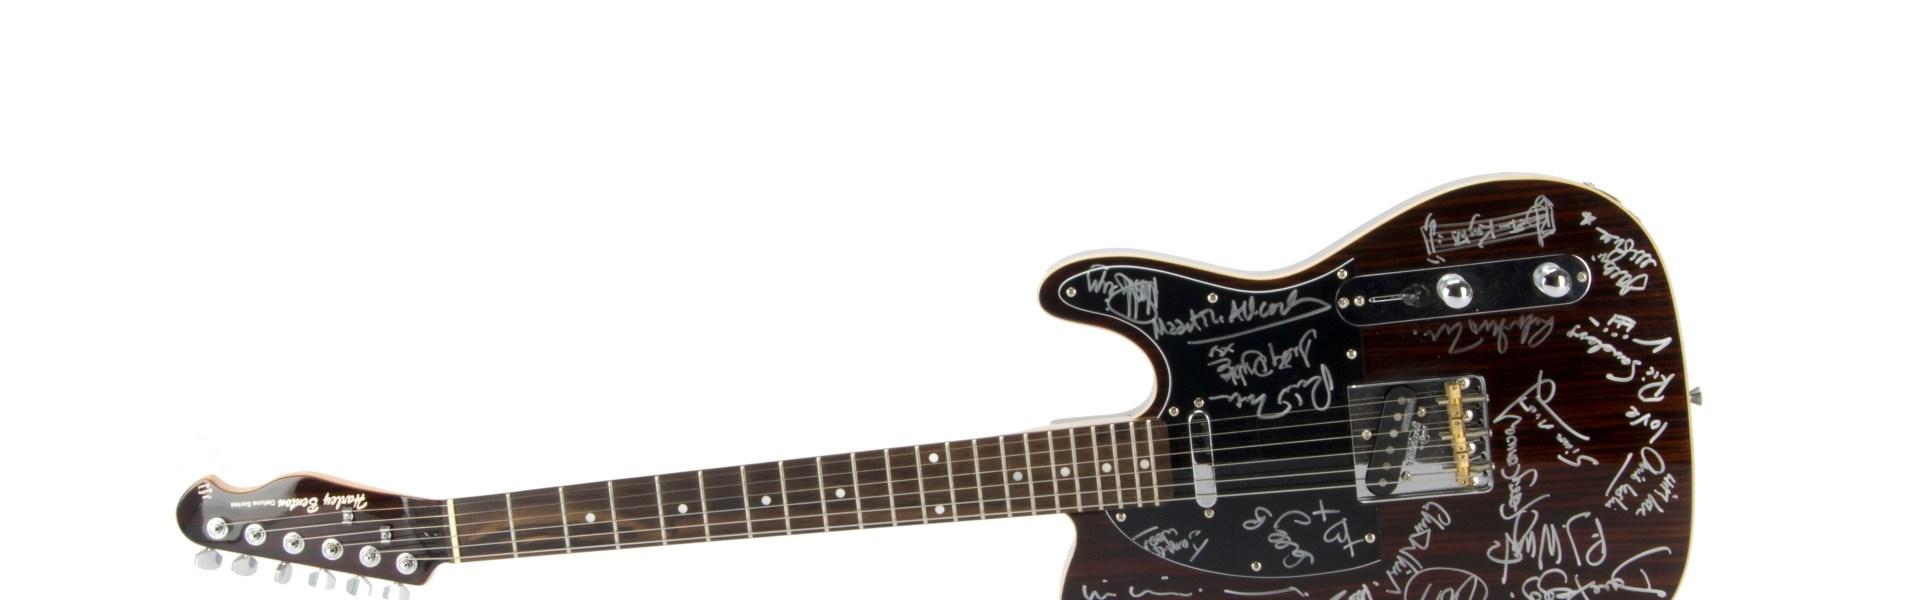 Fairport Convention / Autographs, A Harvey Bentone Guitar signed by Judy Dyble, Richard Thompson,